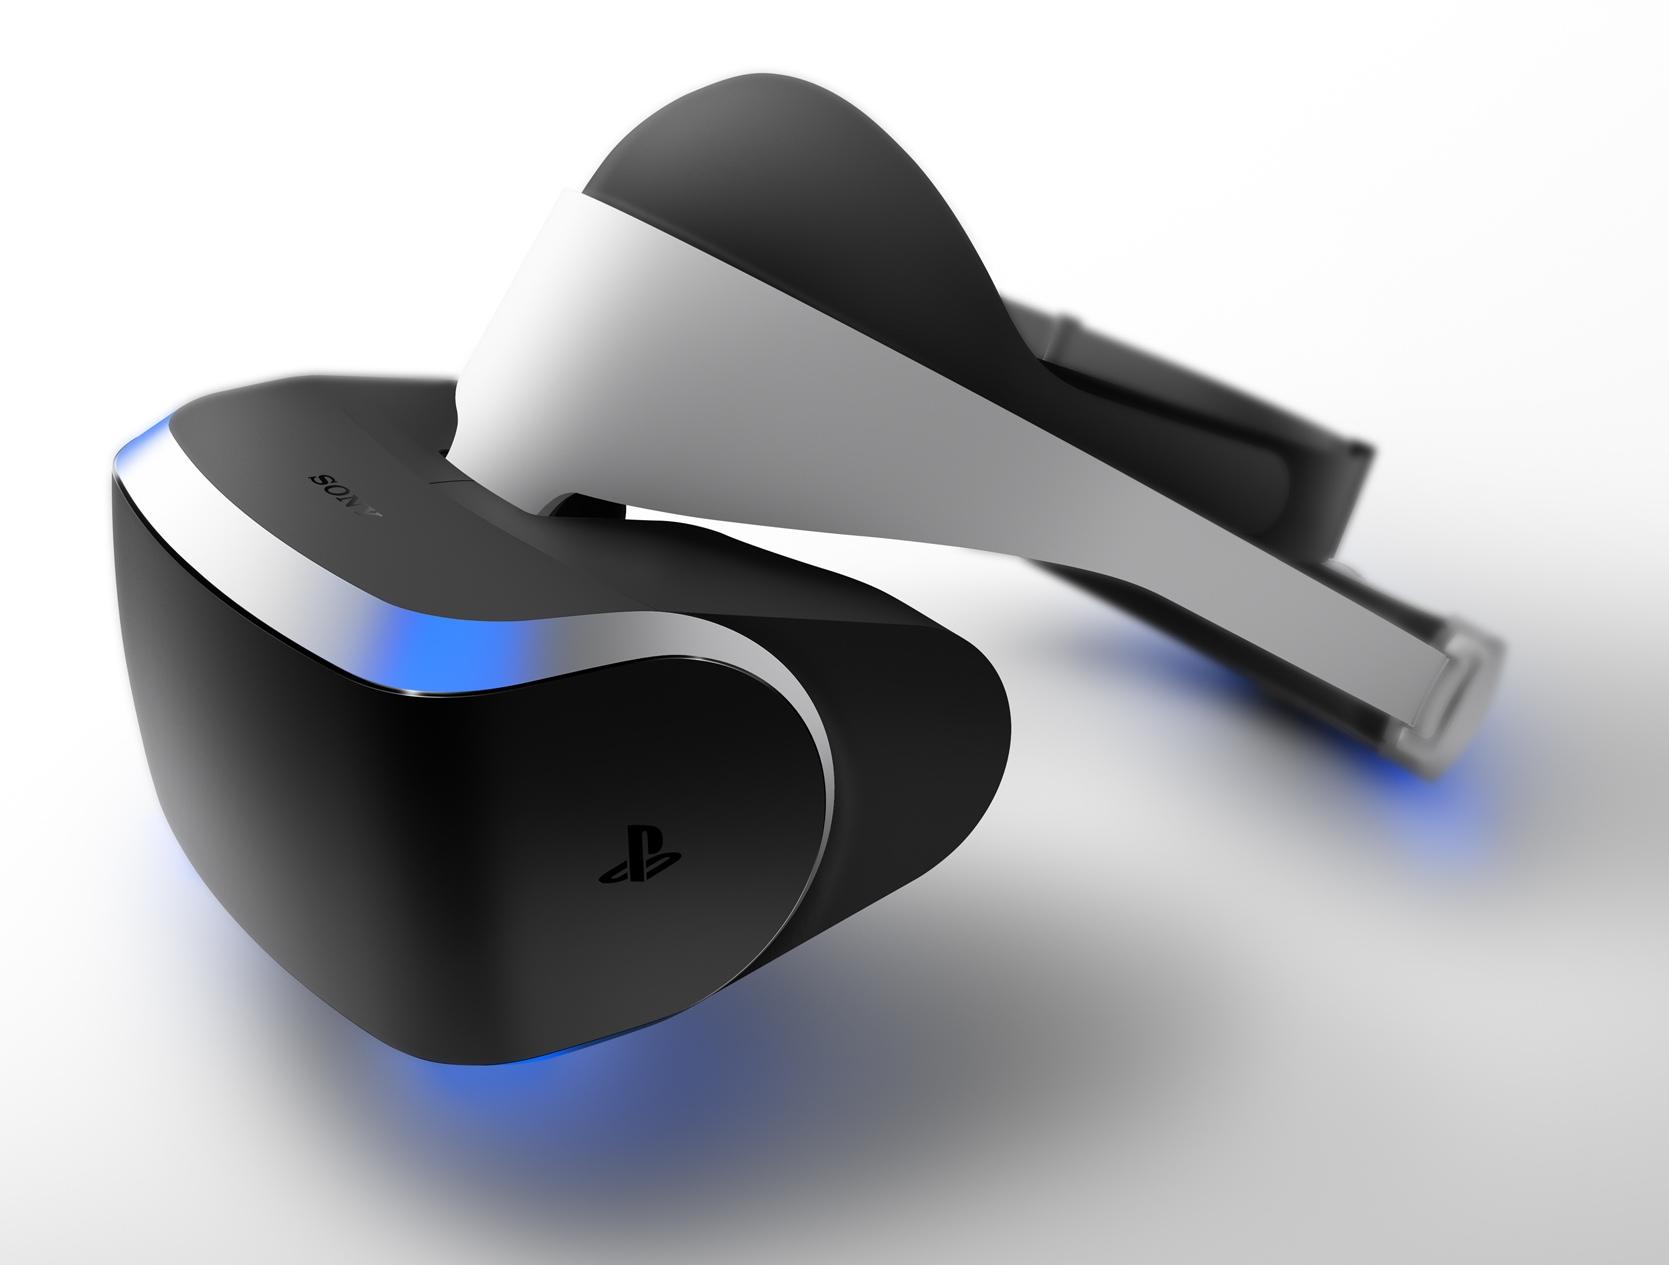 Sony-Project-Morpheus-image-001